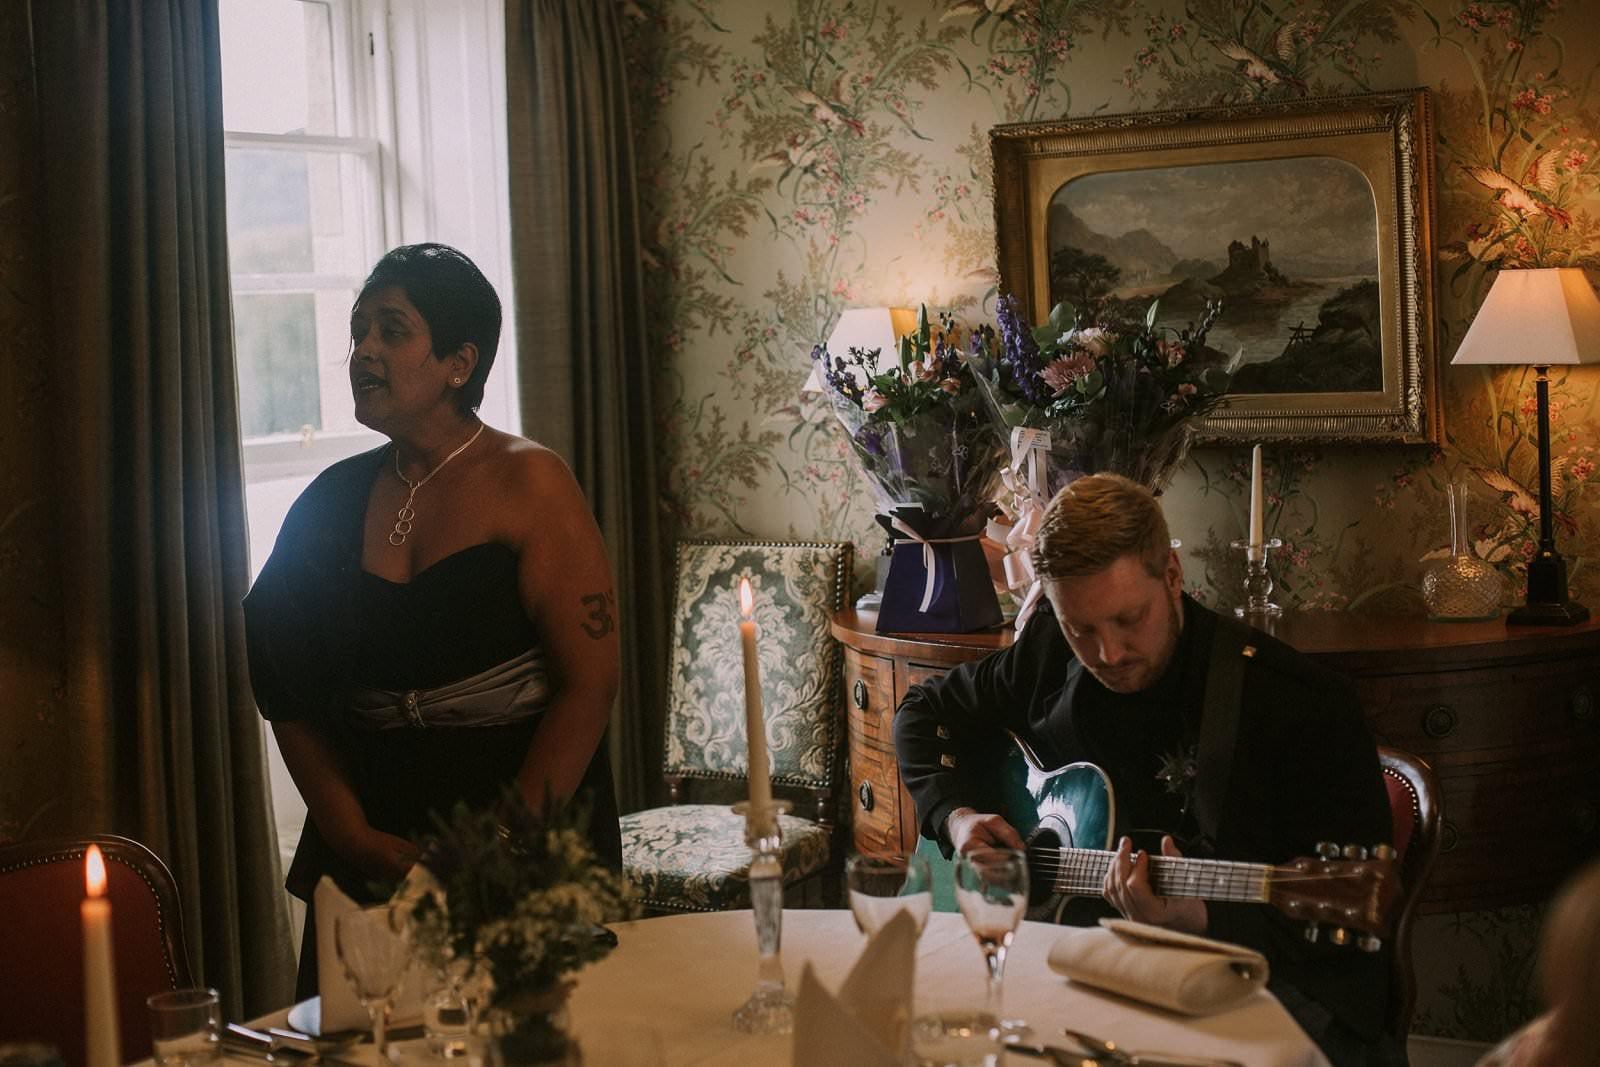 abbotsford-house-wedding-photographer-48